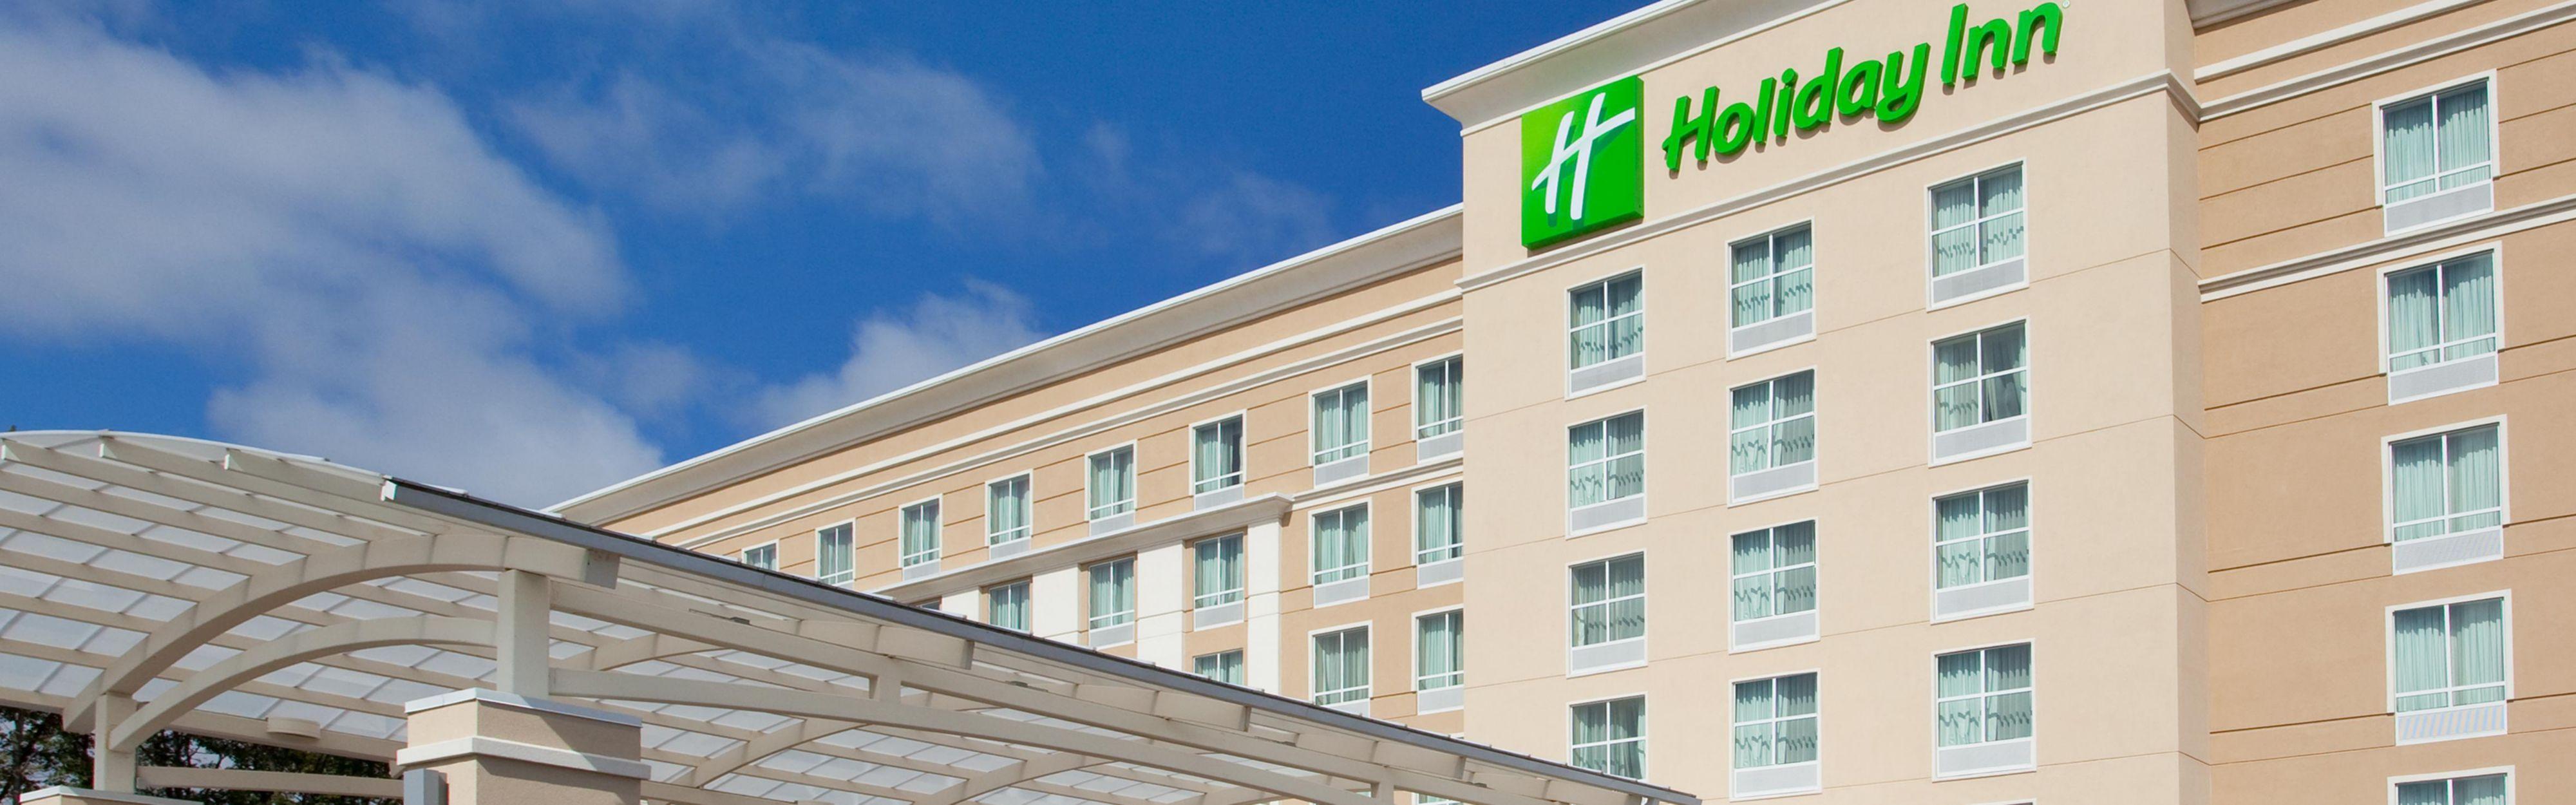 Hotels In Ft Wayne Indiana Near Coliseum